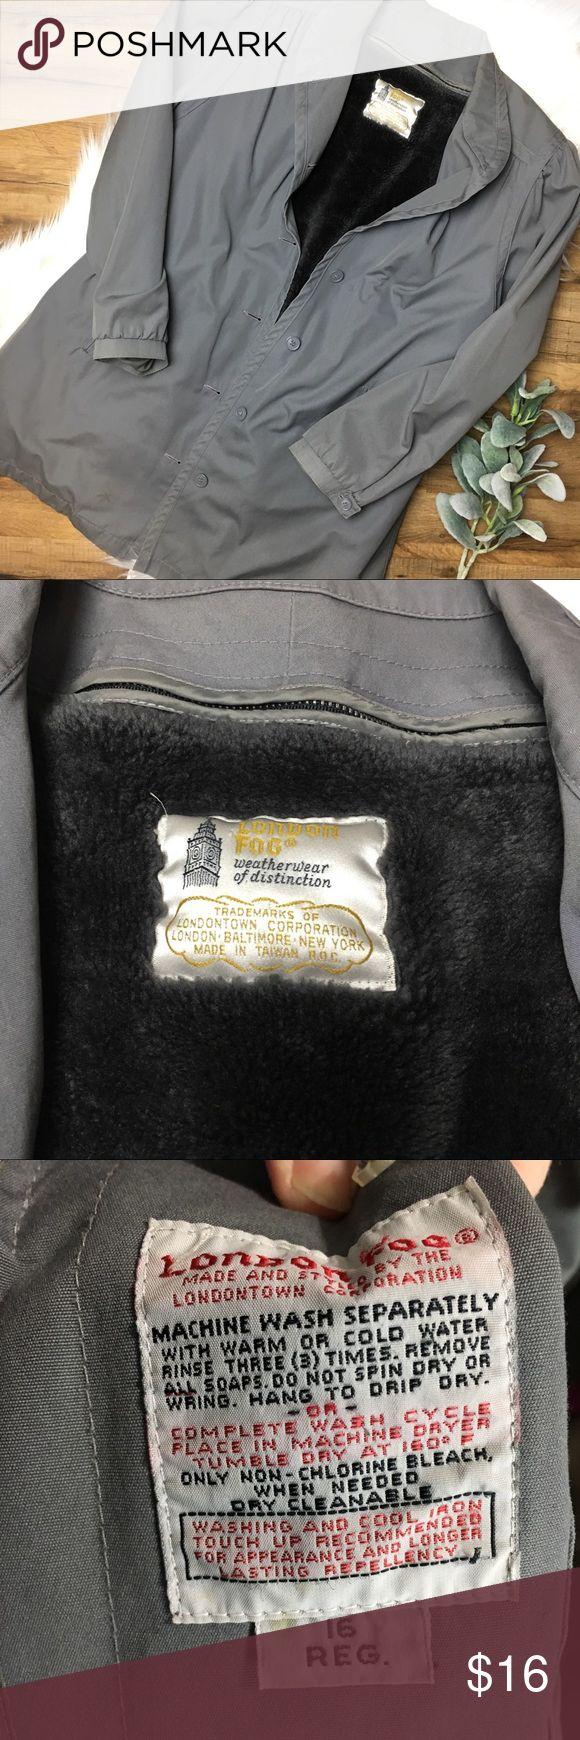 London Fog Faux Fur lined Coat London Fog Faux Fur Lined Coat Size 16 Fur lining can be removed. It is attached by a Zipper Has some spots & light discoloration. London Fog Jackets & Coats